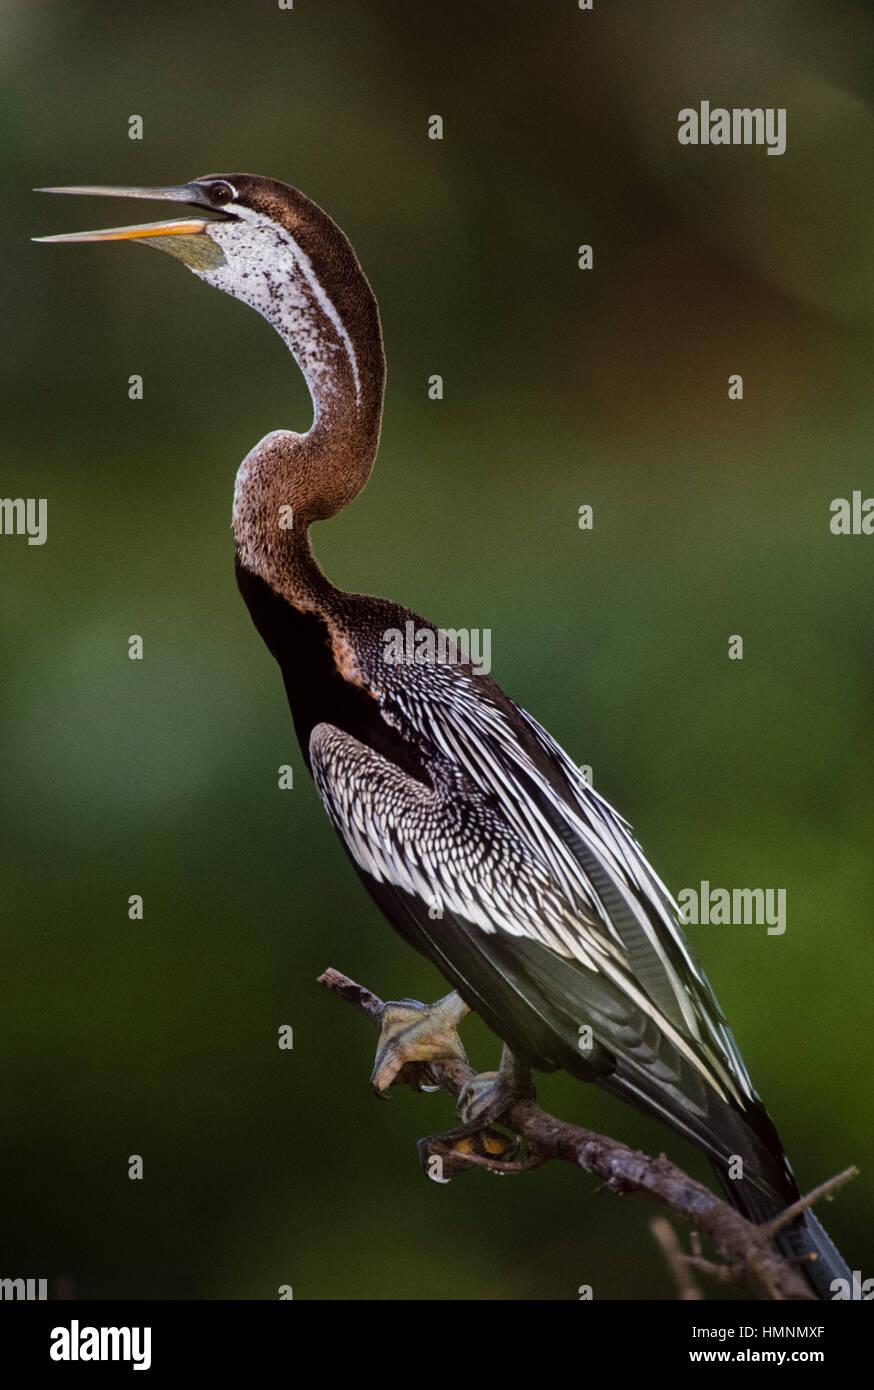 Oriental darter or Indian darter, (Anhinga melanogaster), cooling down with beak open,Keoladeo Ghana National Park,Bharatpur,Rajasthan, - Stock Image